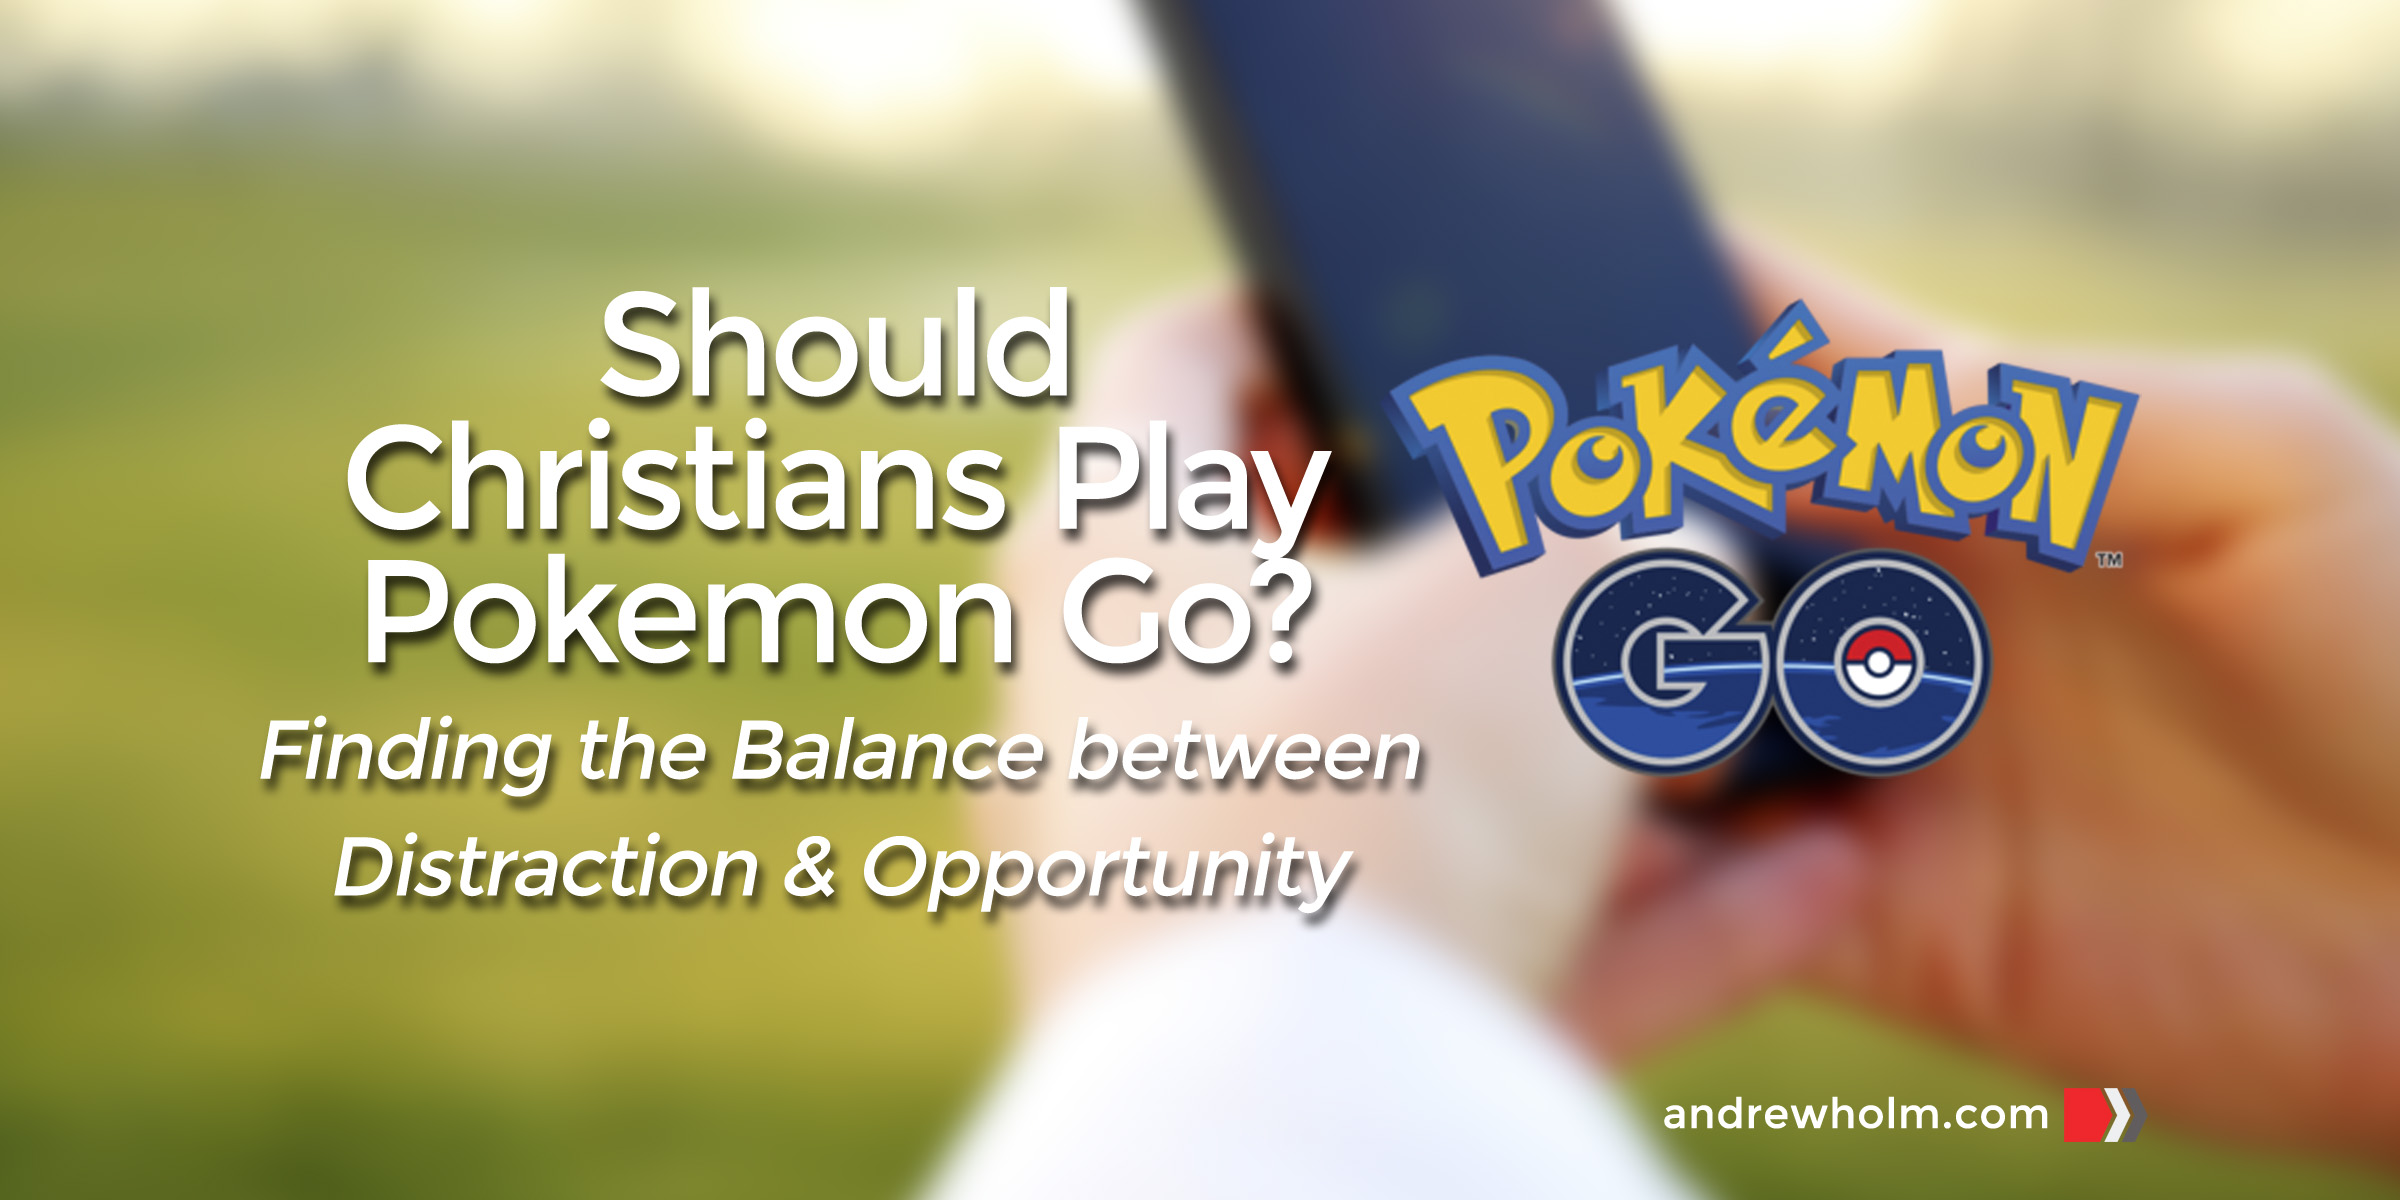 Should Christians Play Pokemon Go?